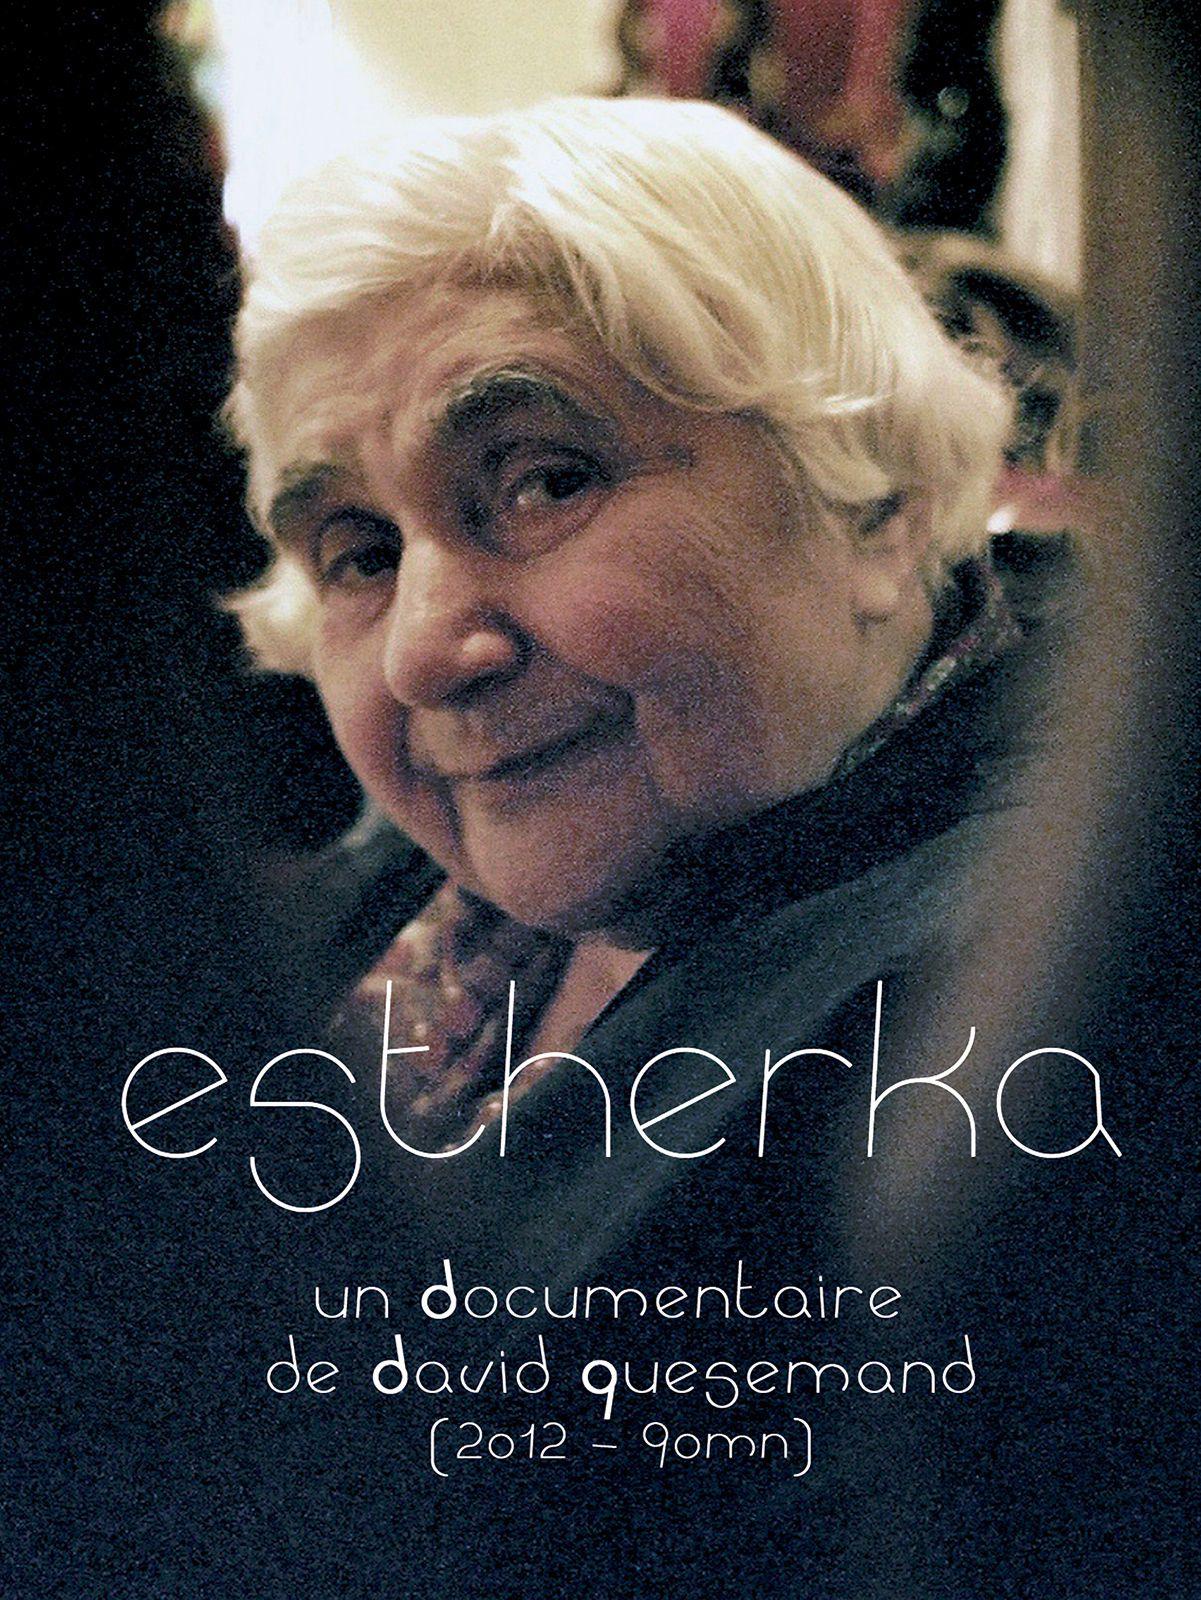 Estherka - Documentaire (2014)